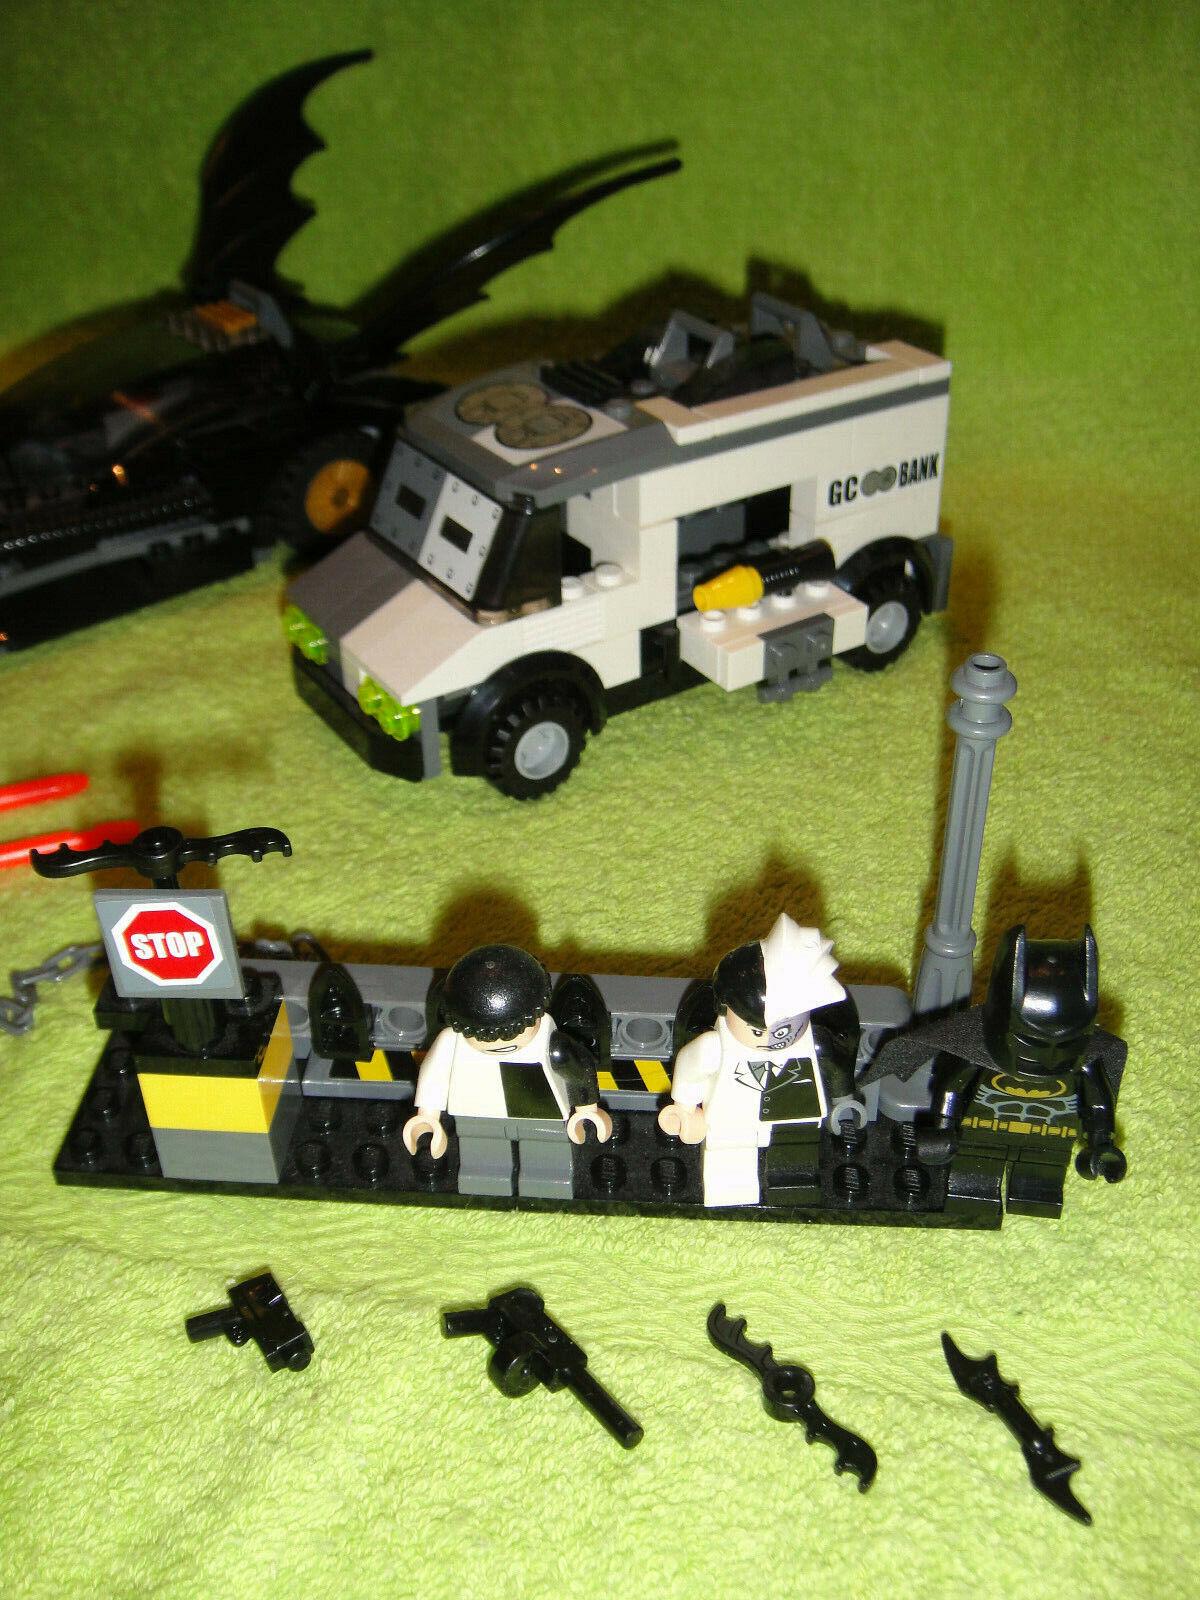 Lego Batman 7781 Two Face Escape Gehilfe Gehilfe Gehilfe Fahrzeug Batmobile 64caae